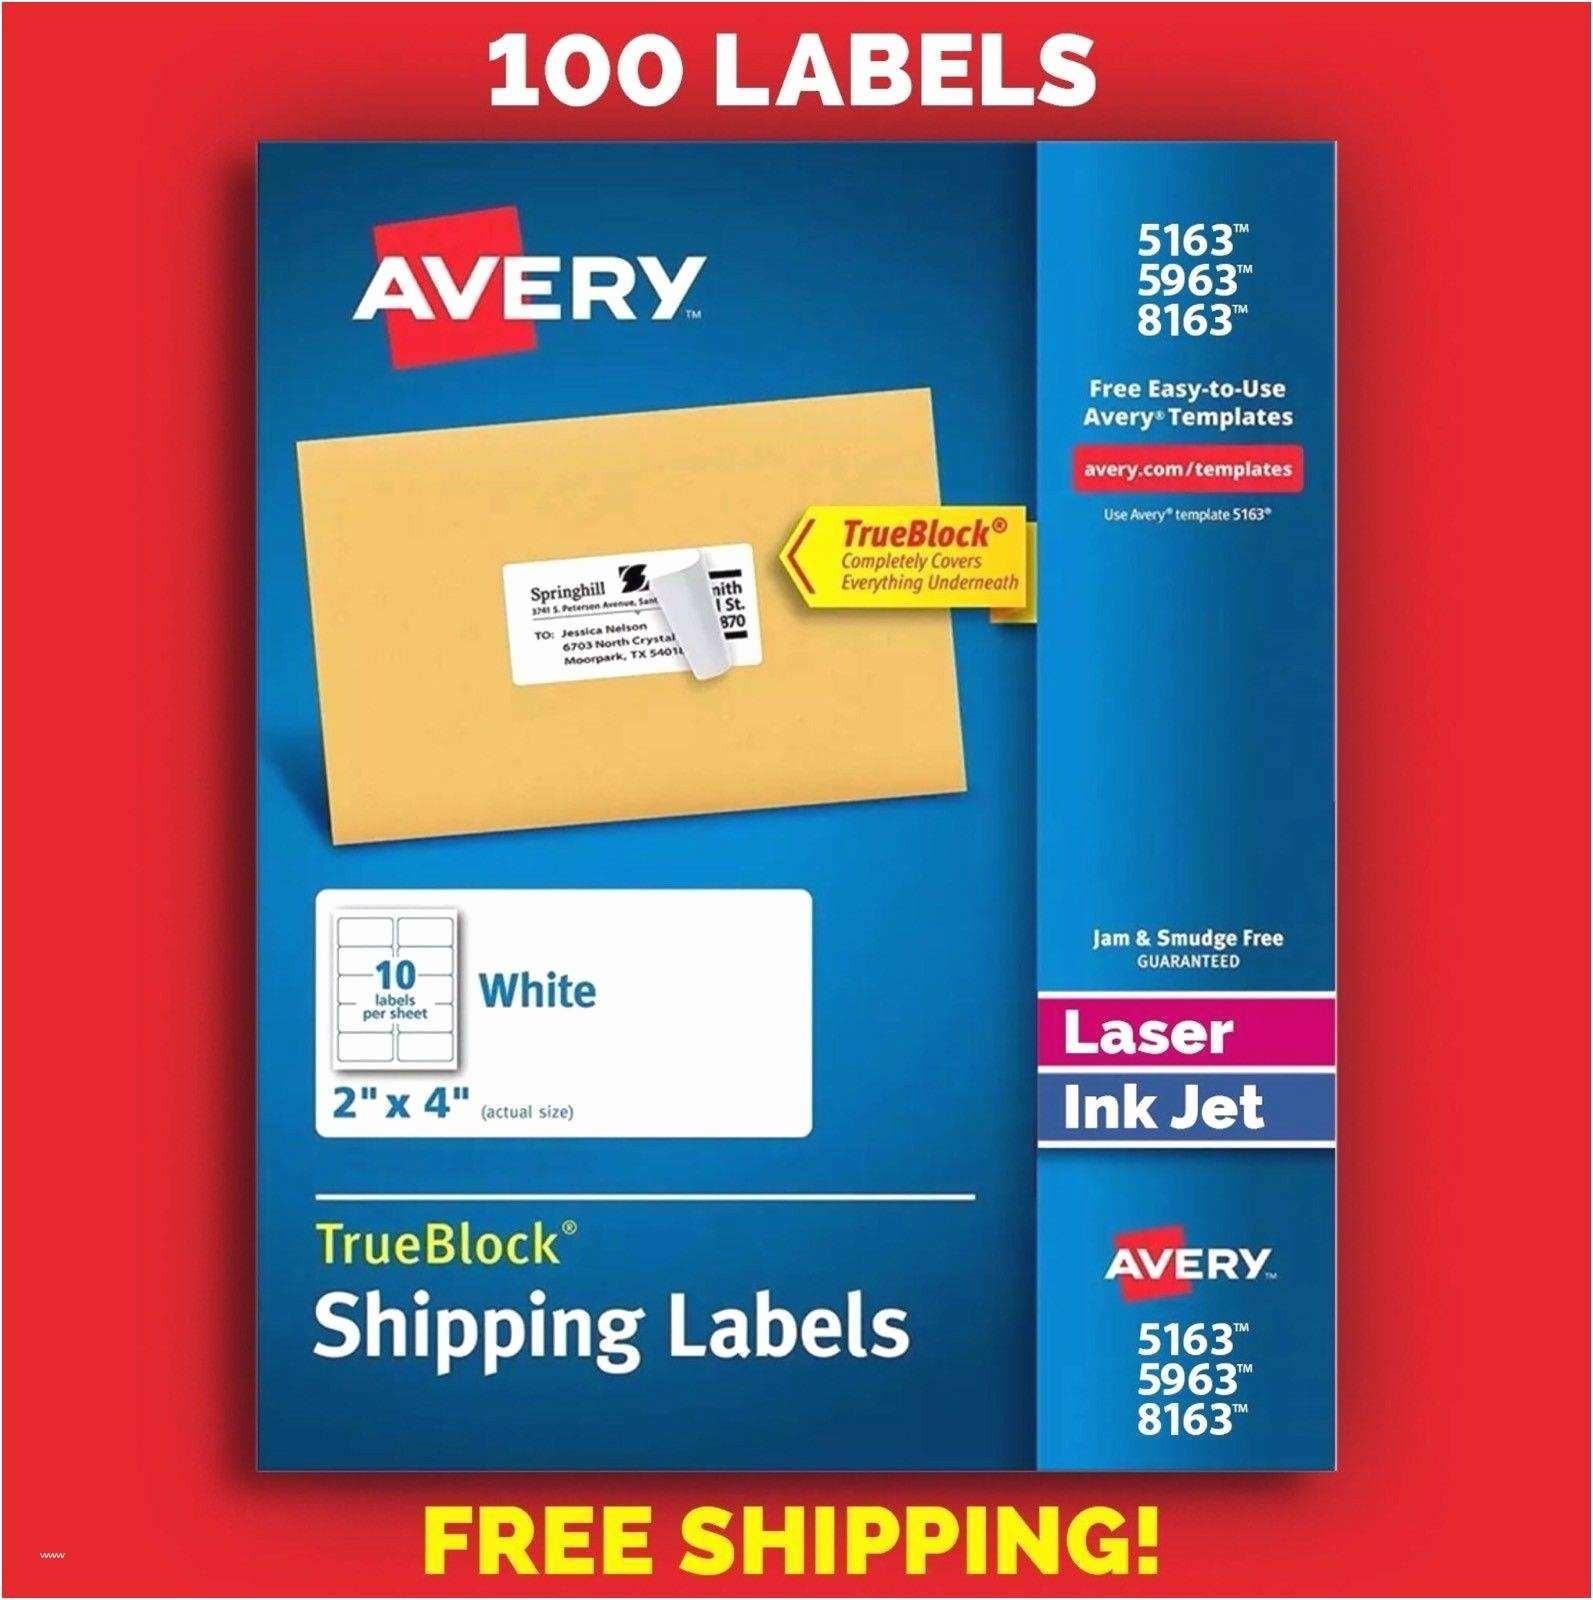 avery com templates 8163 free